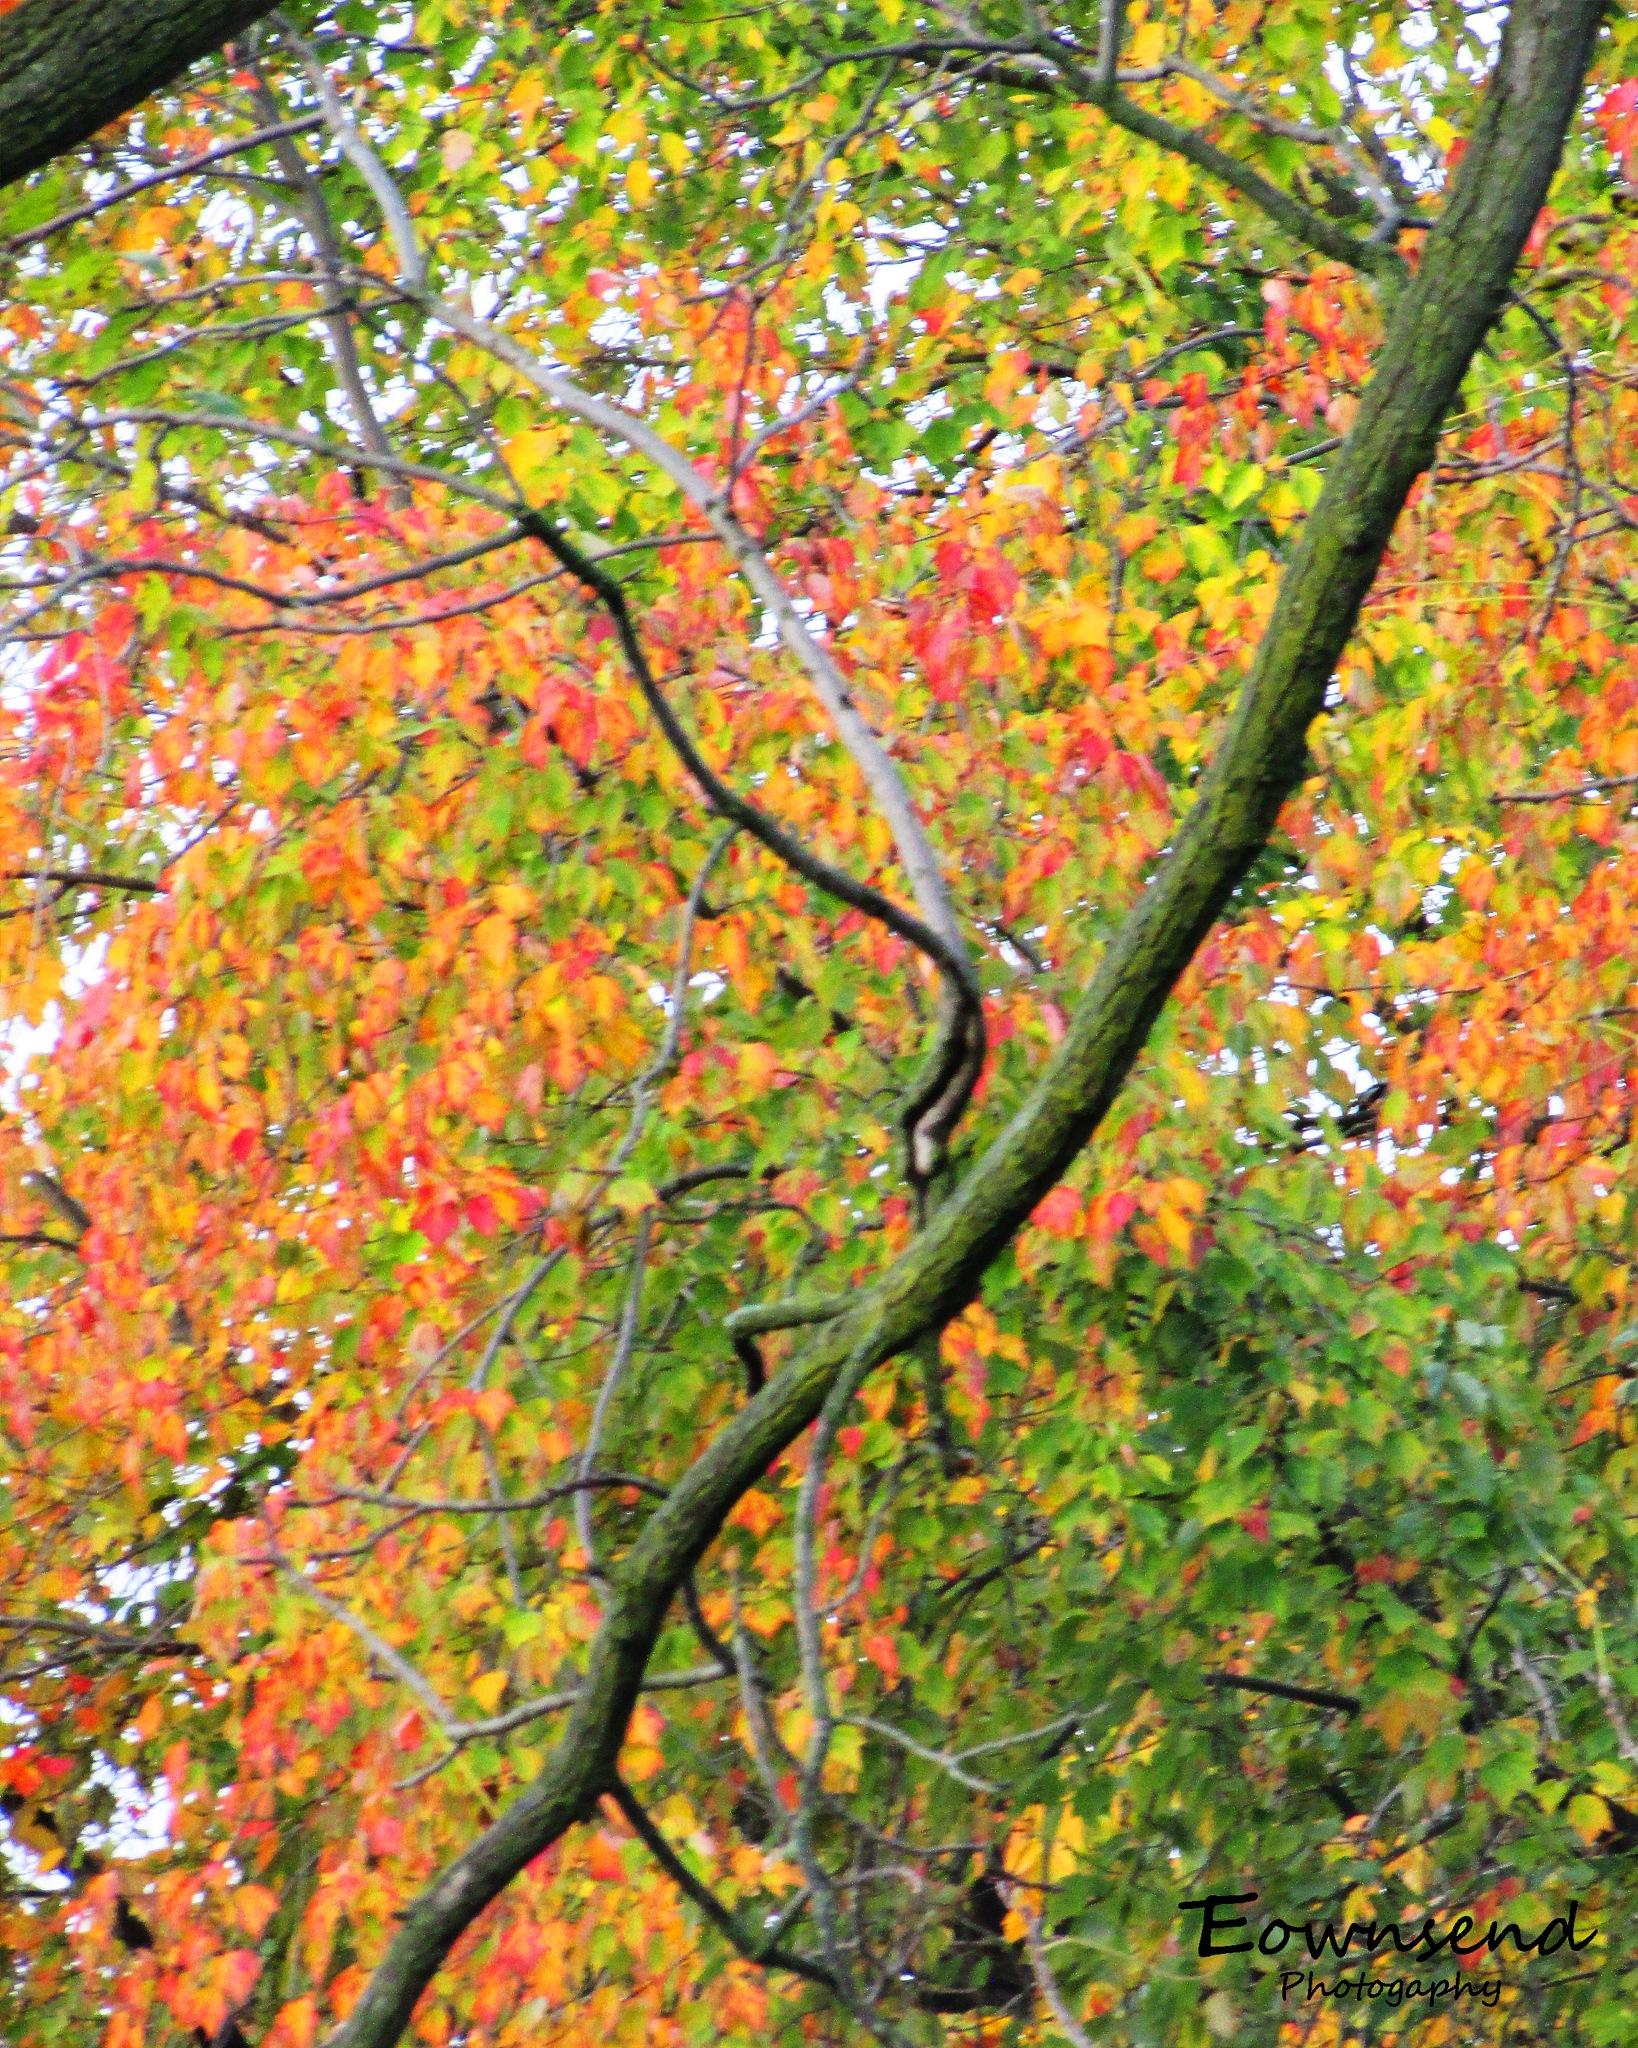 Leaves by Elizabeth C. Townsend